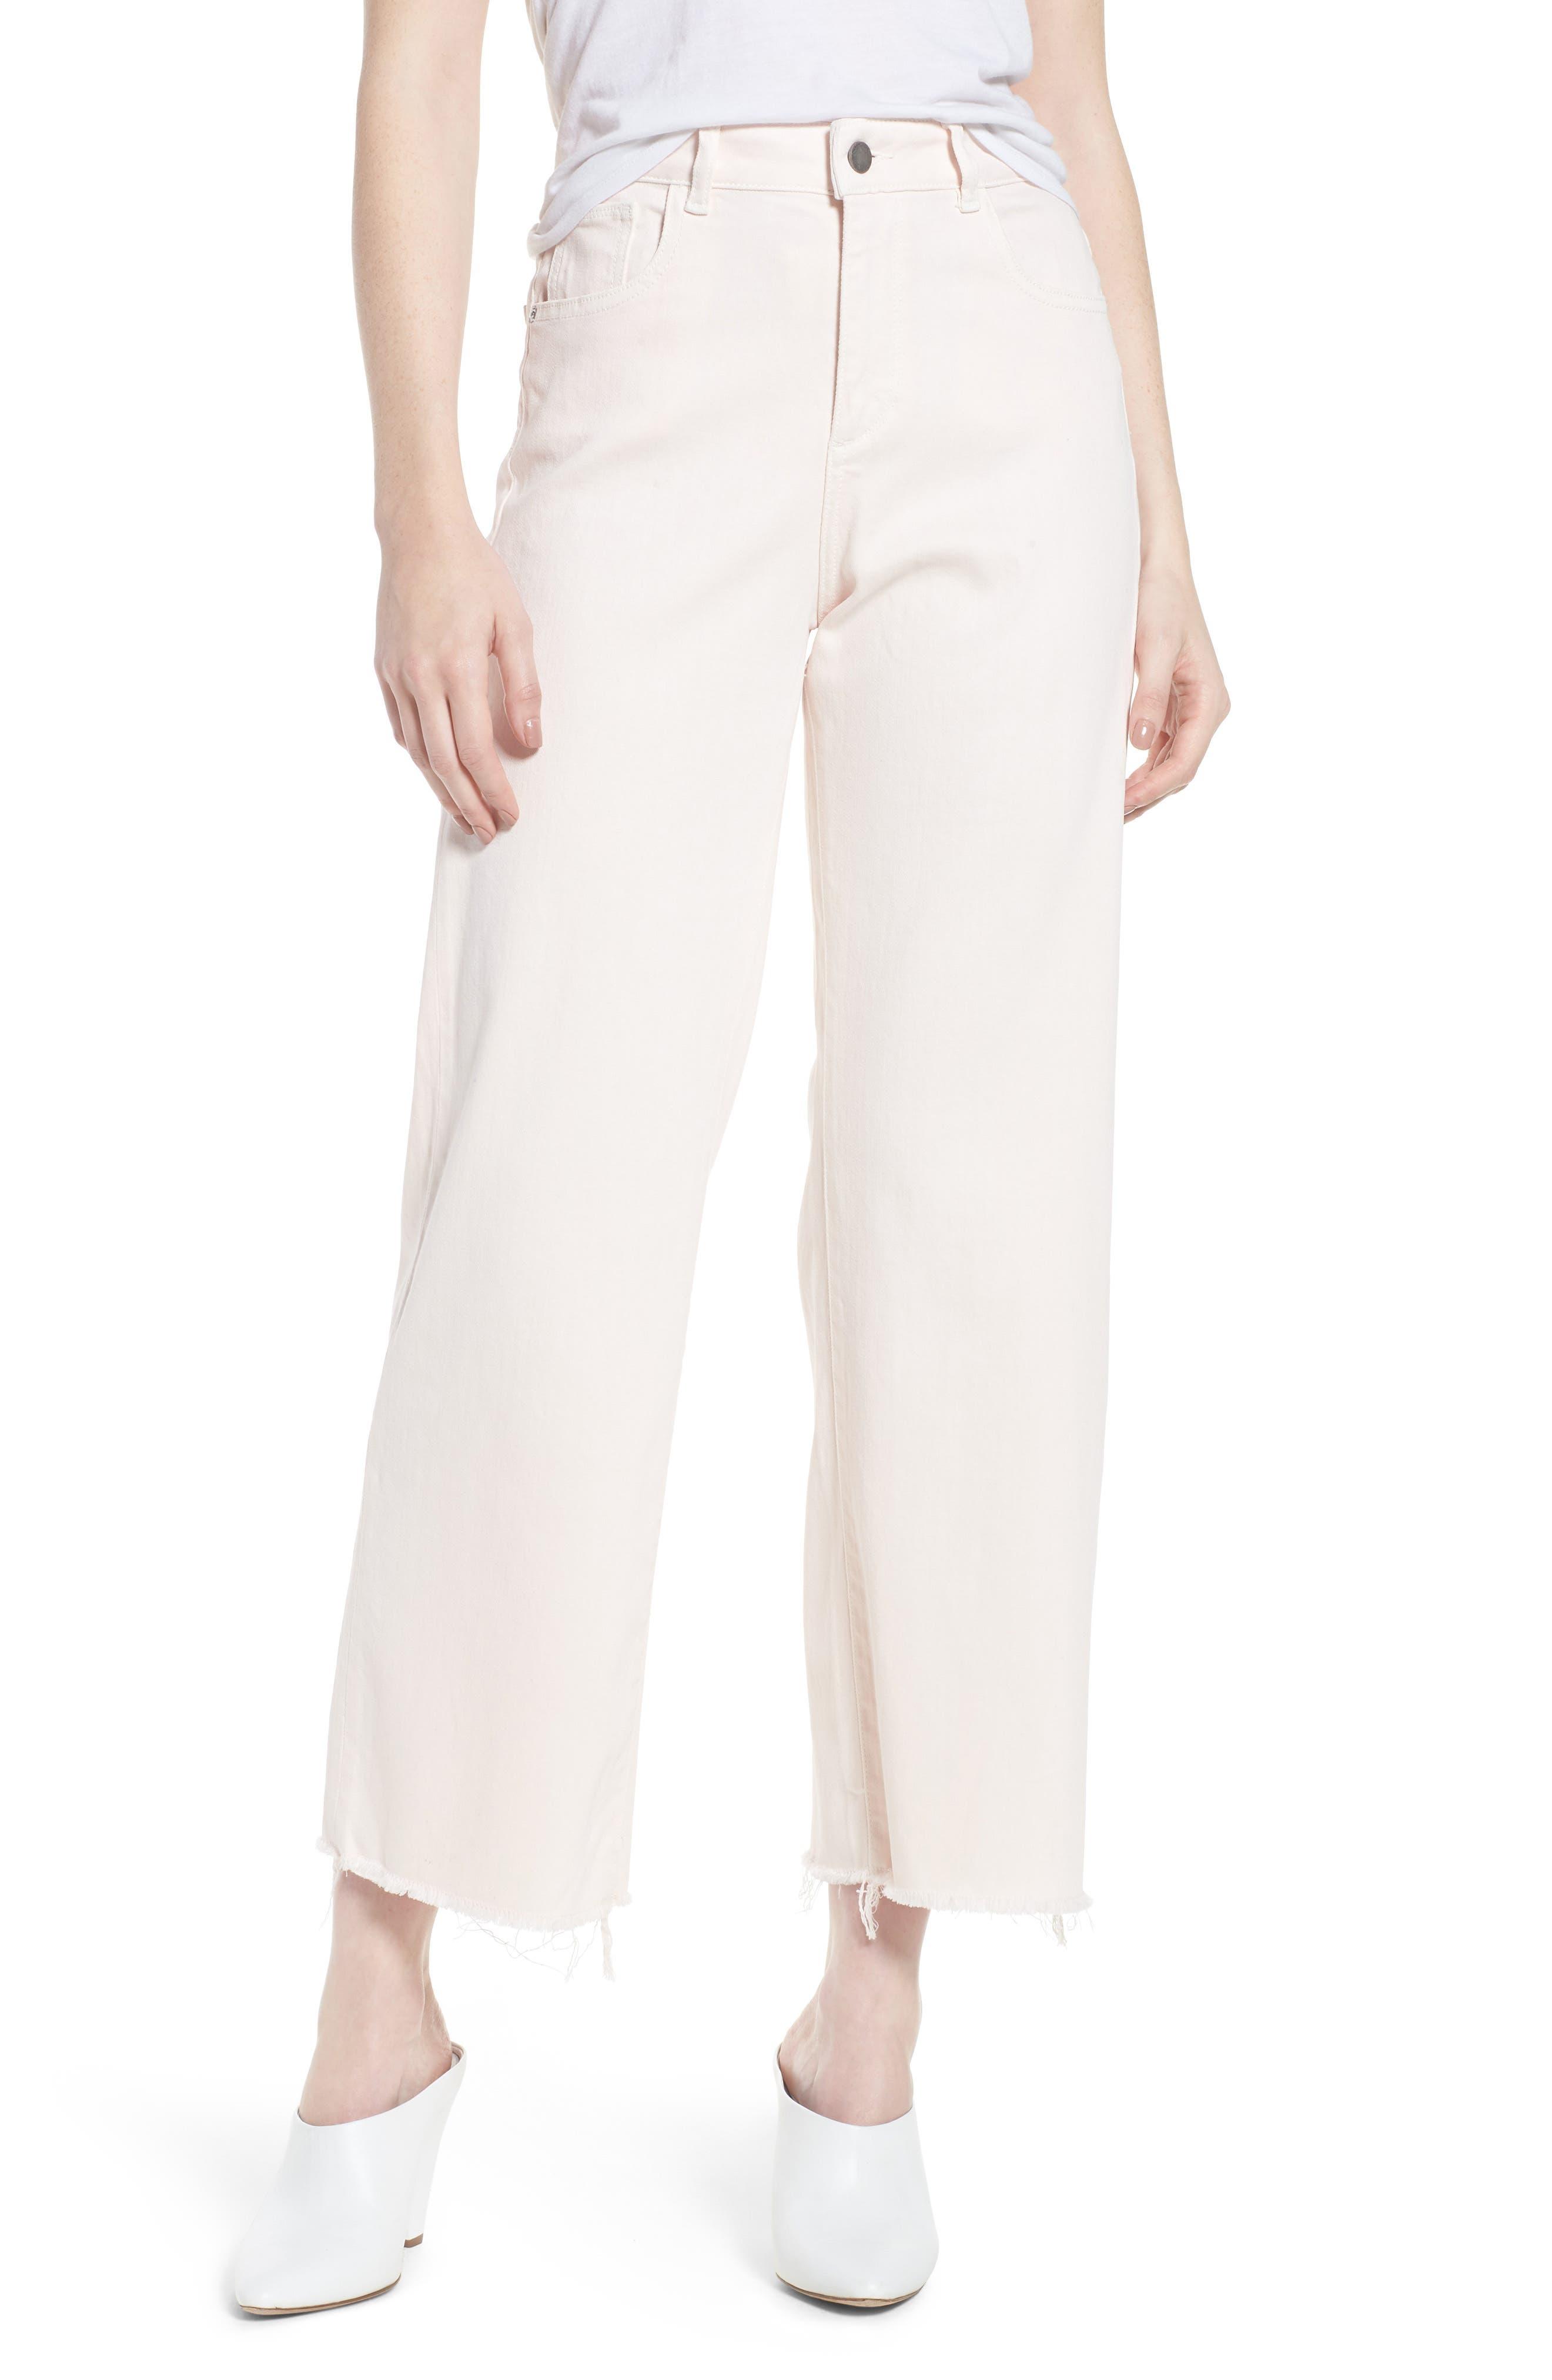 Hepburn Ankle Wide Leg Jeans,                             Main thumbnail 1, color,                             Blush Pink